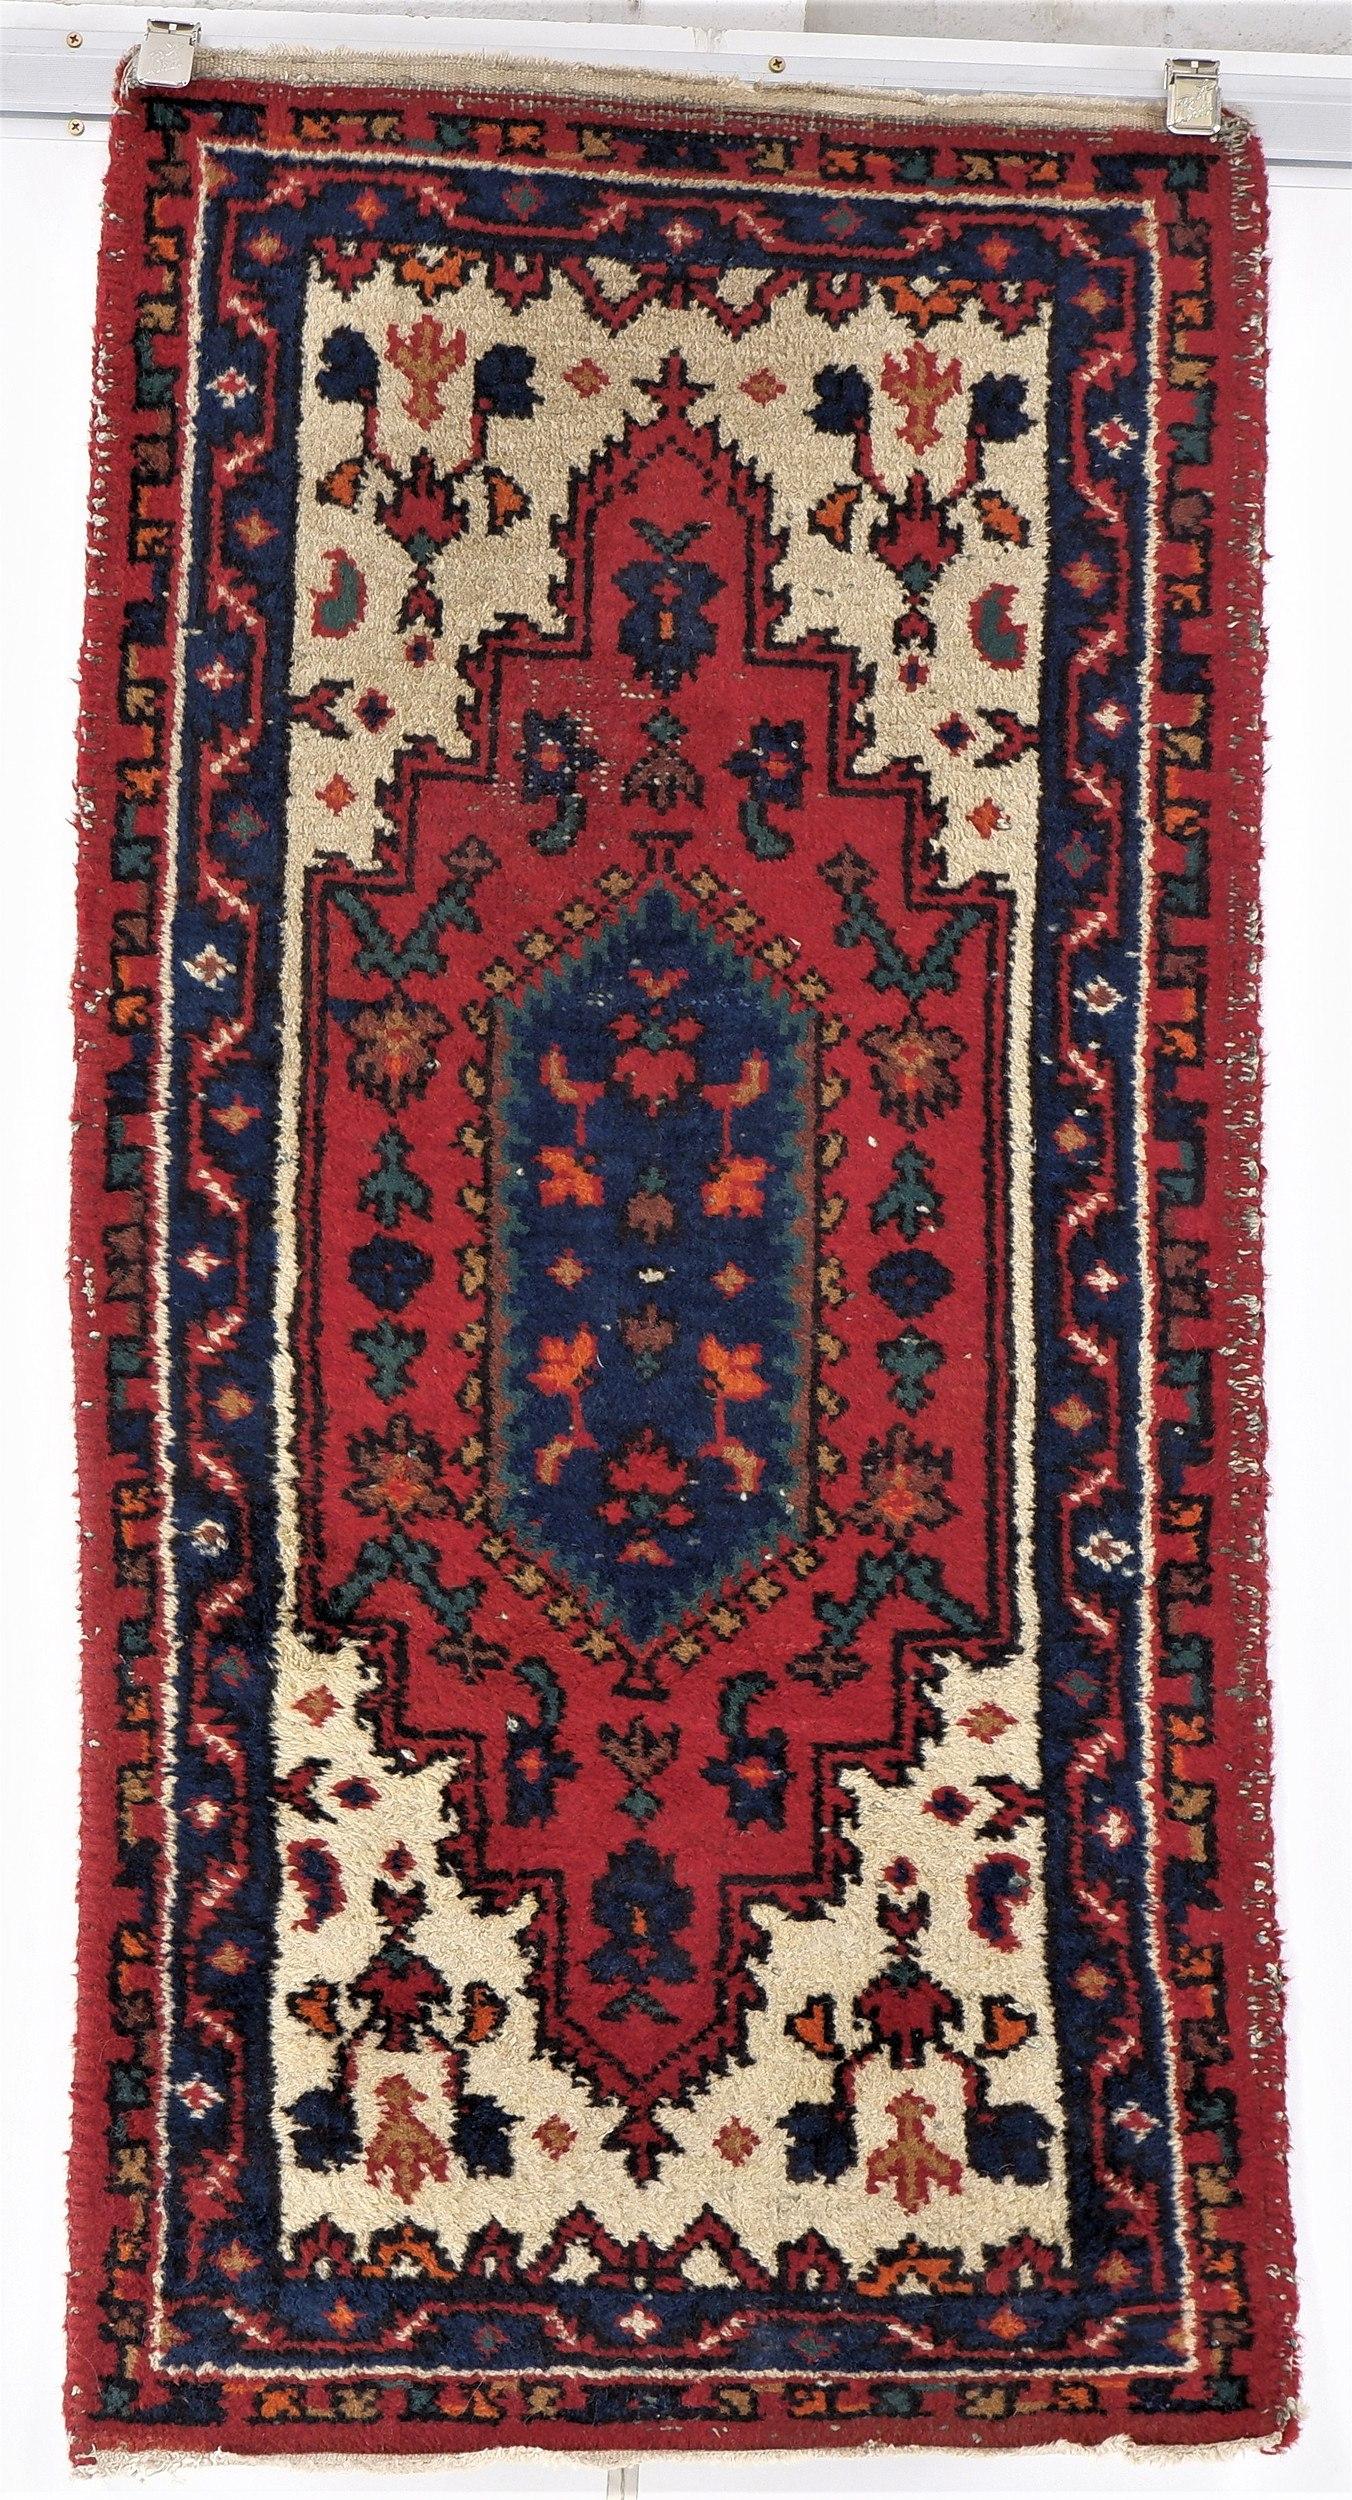 'Vintage Persian Hamadan Hand Knotted Wool Rug '